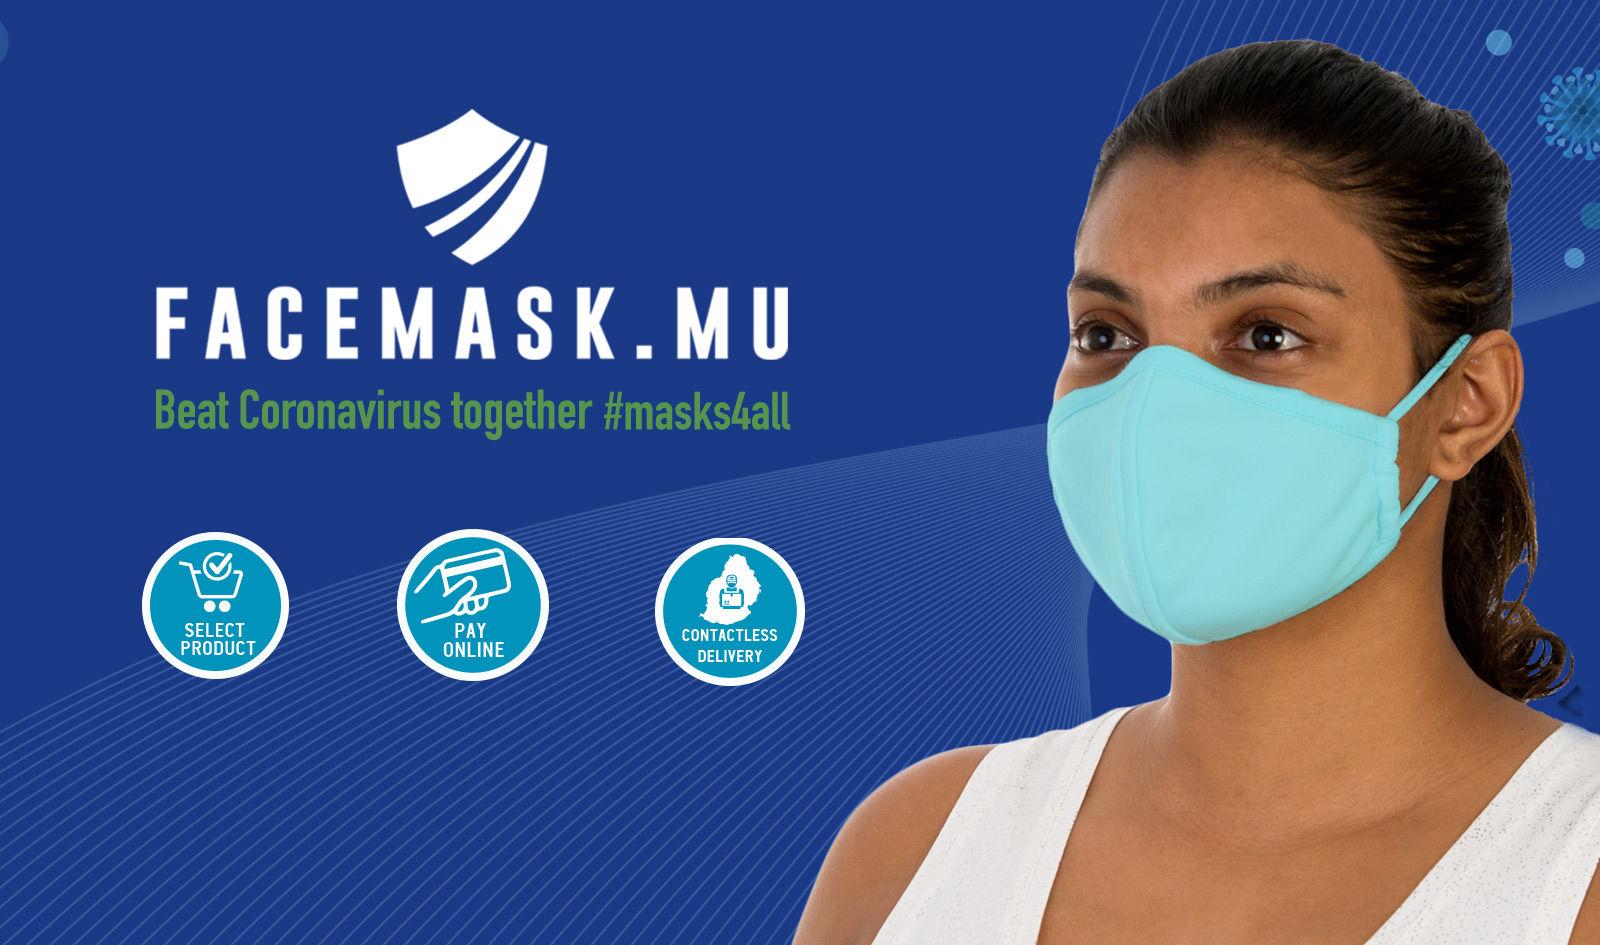 Facemask.mu Banner